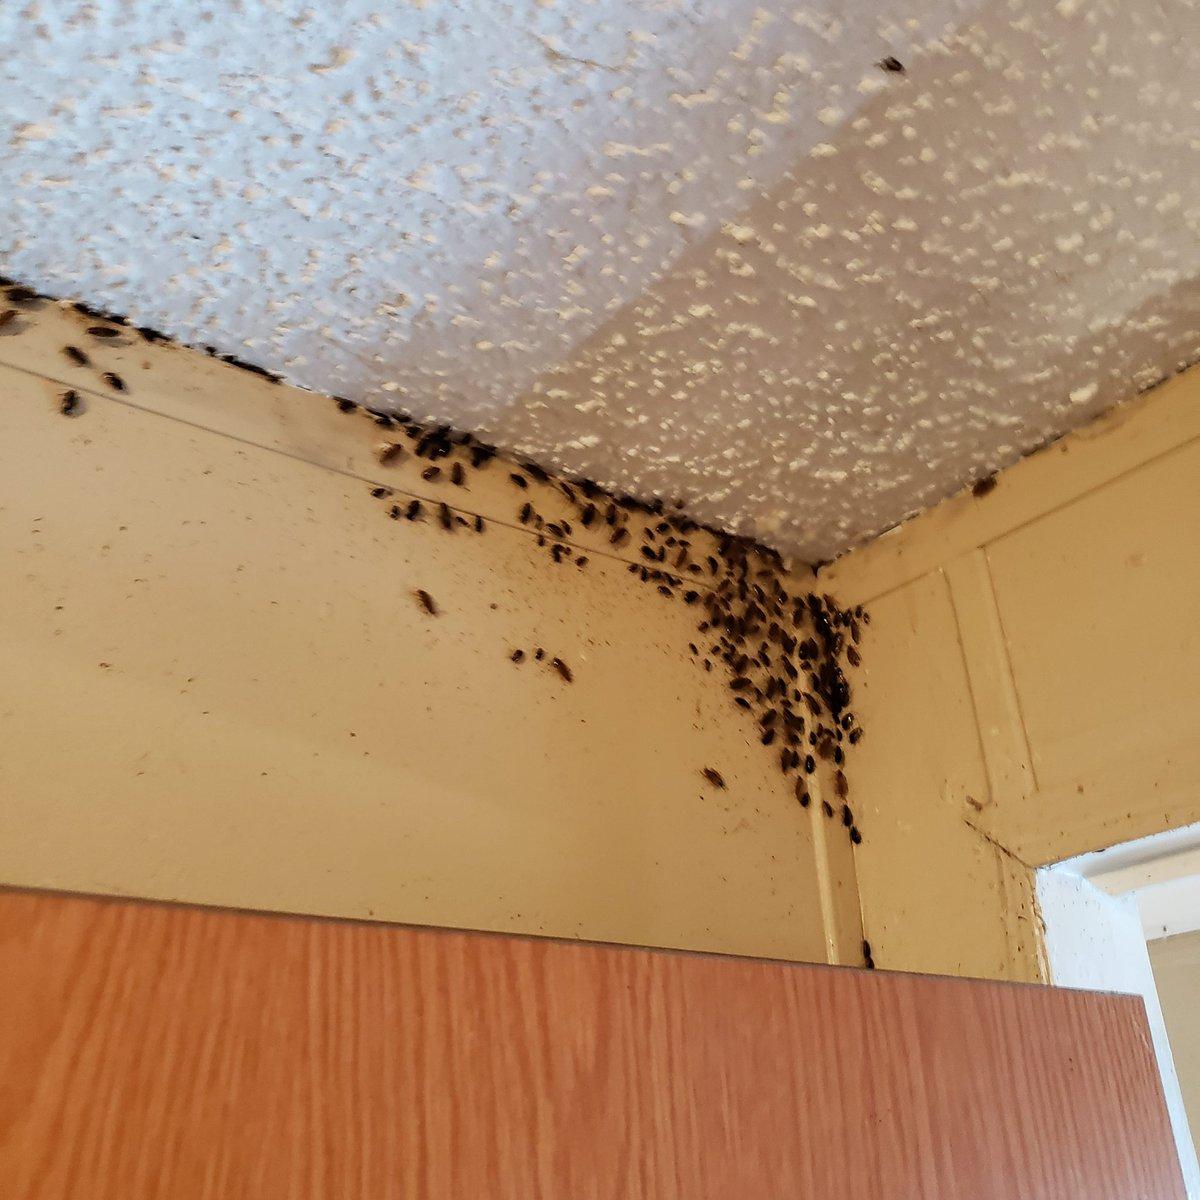 Superior Termite And Pest Control Superiorcontrol Twitter